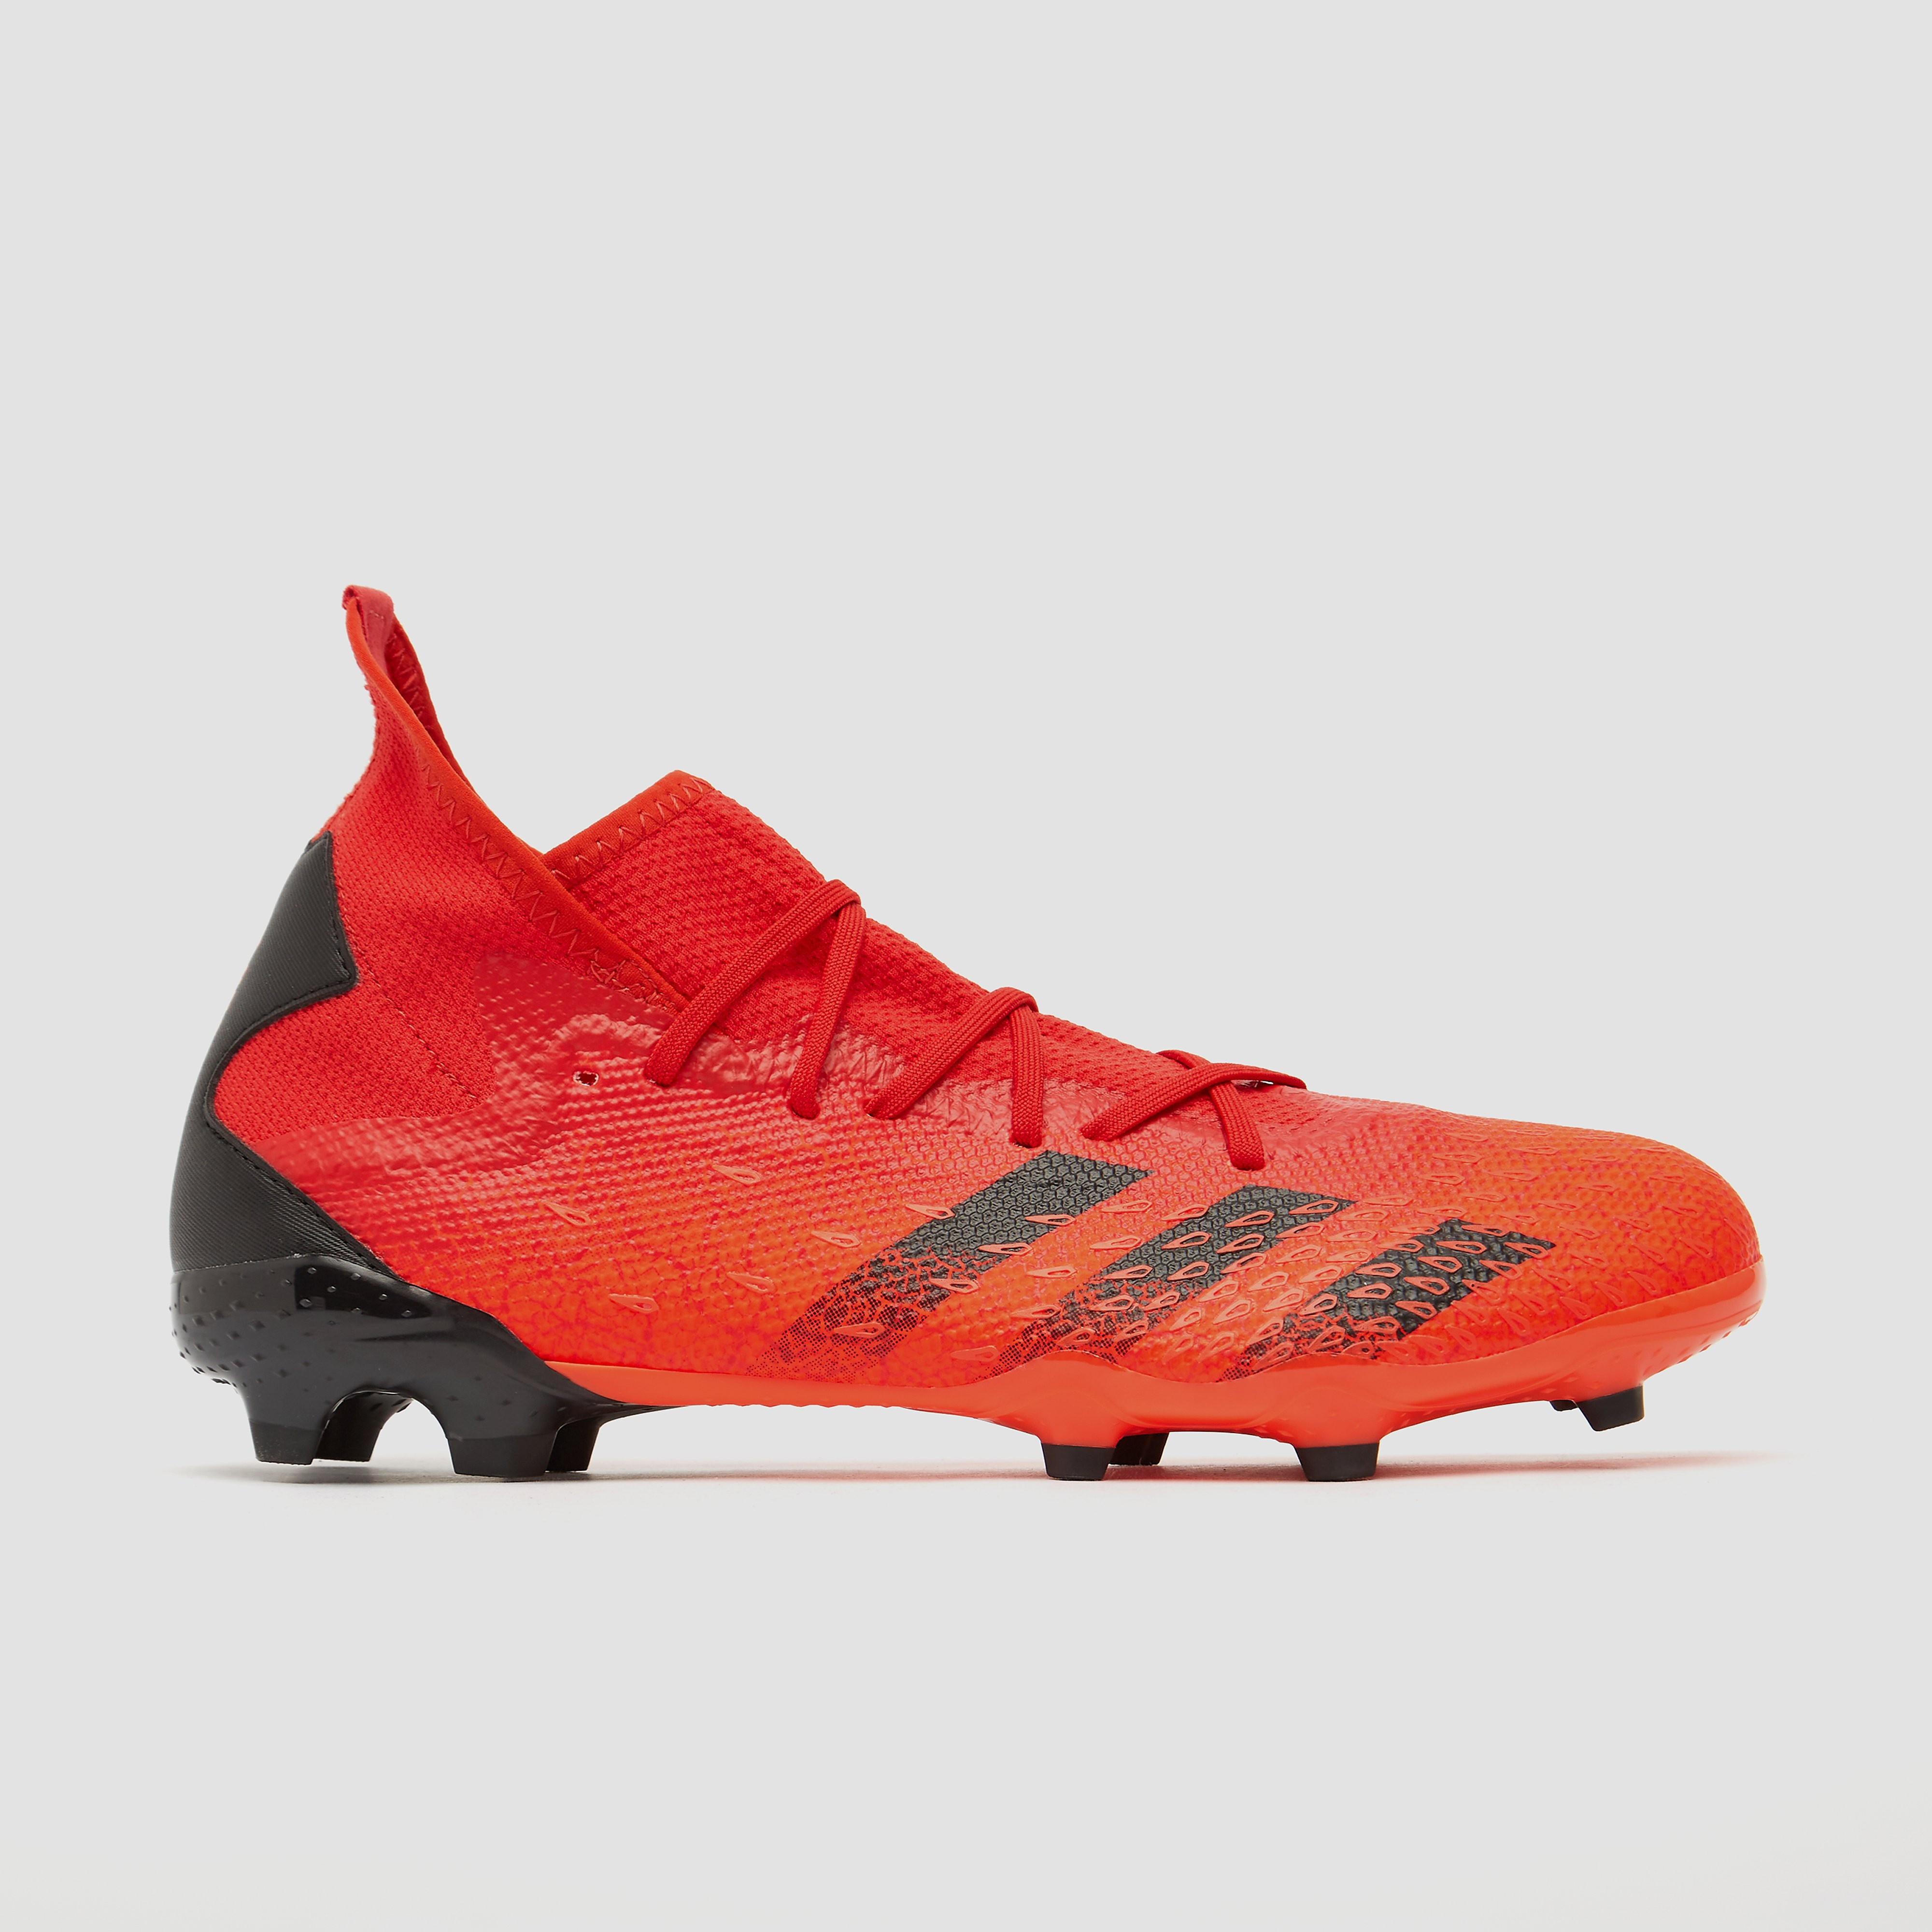 NU 20% KORTING: adidas Performance voetbalschoenen PREDATOR FREAK .3 FG